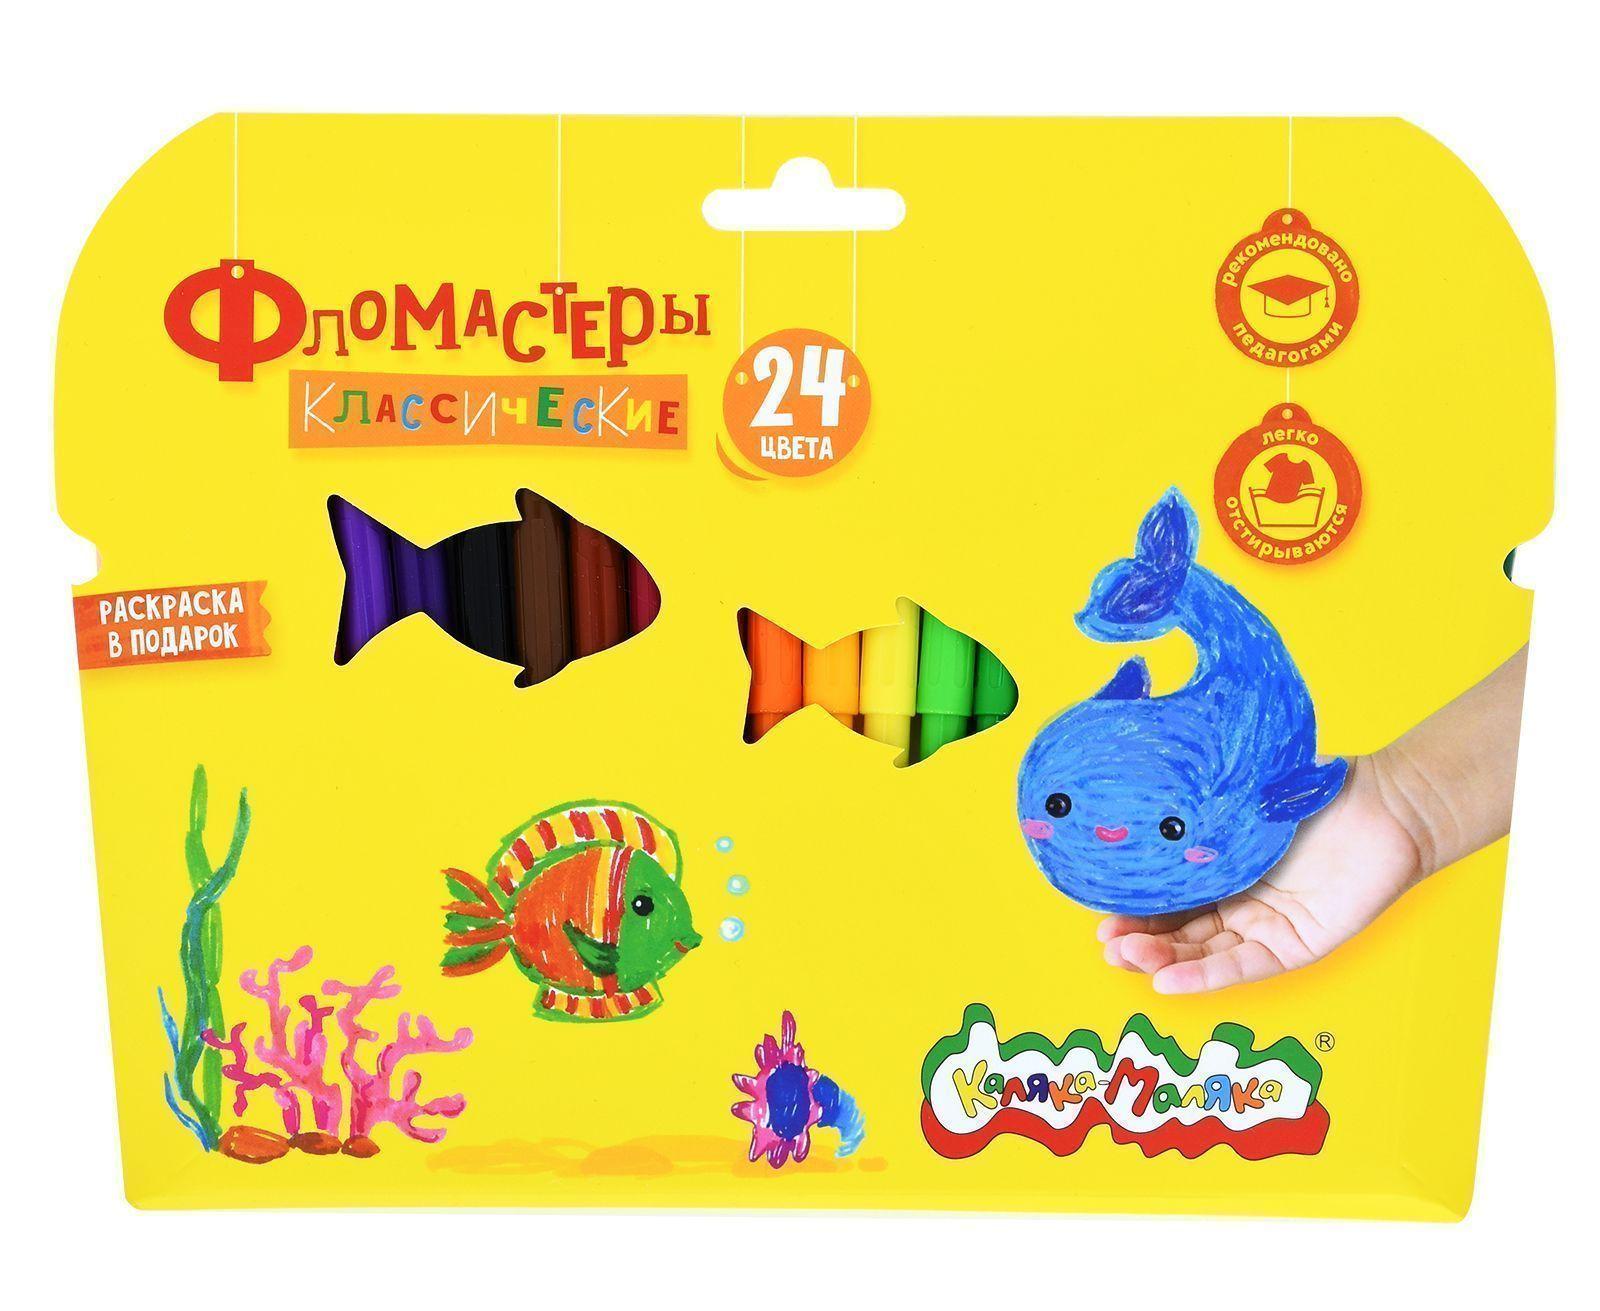 Фломастеры Каляка-Маляка 24 цвета, картонная упаковка, круглый корпус, классические